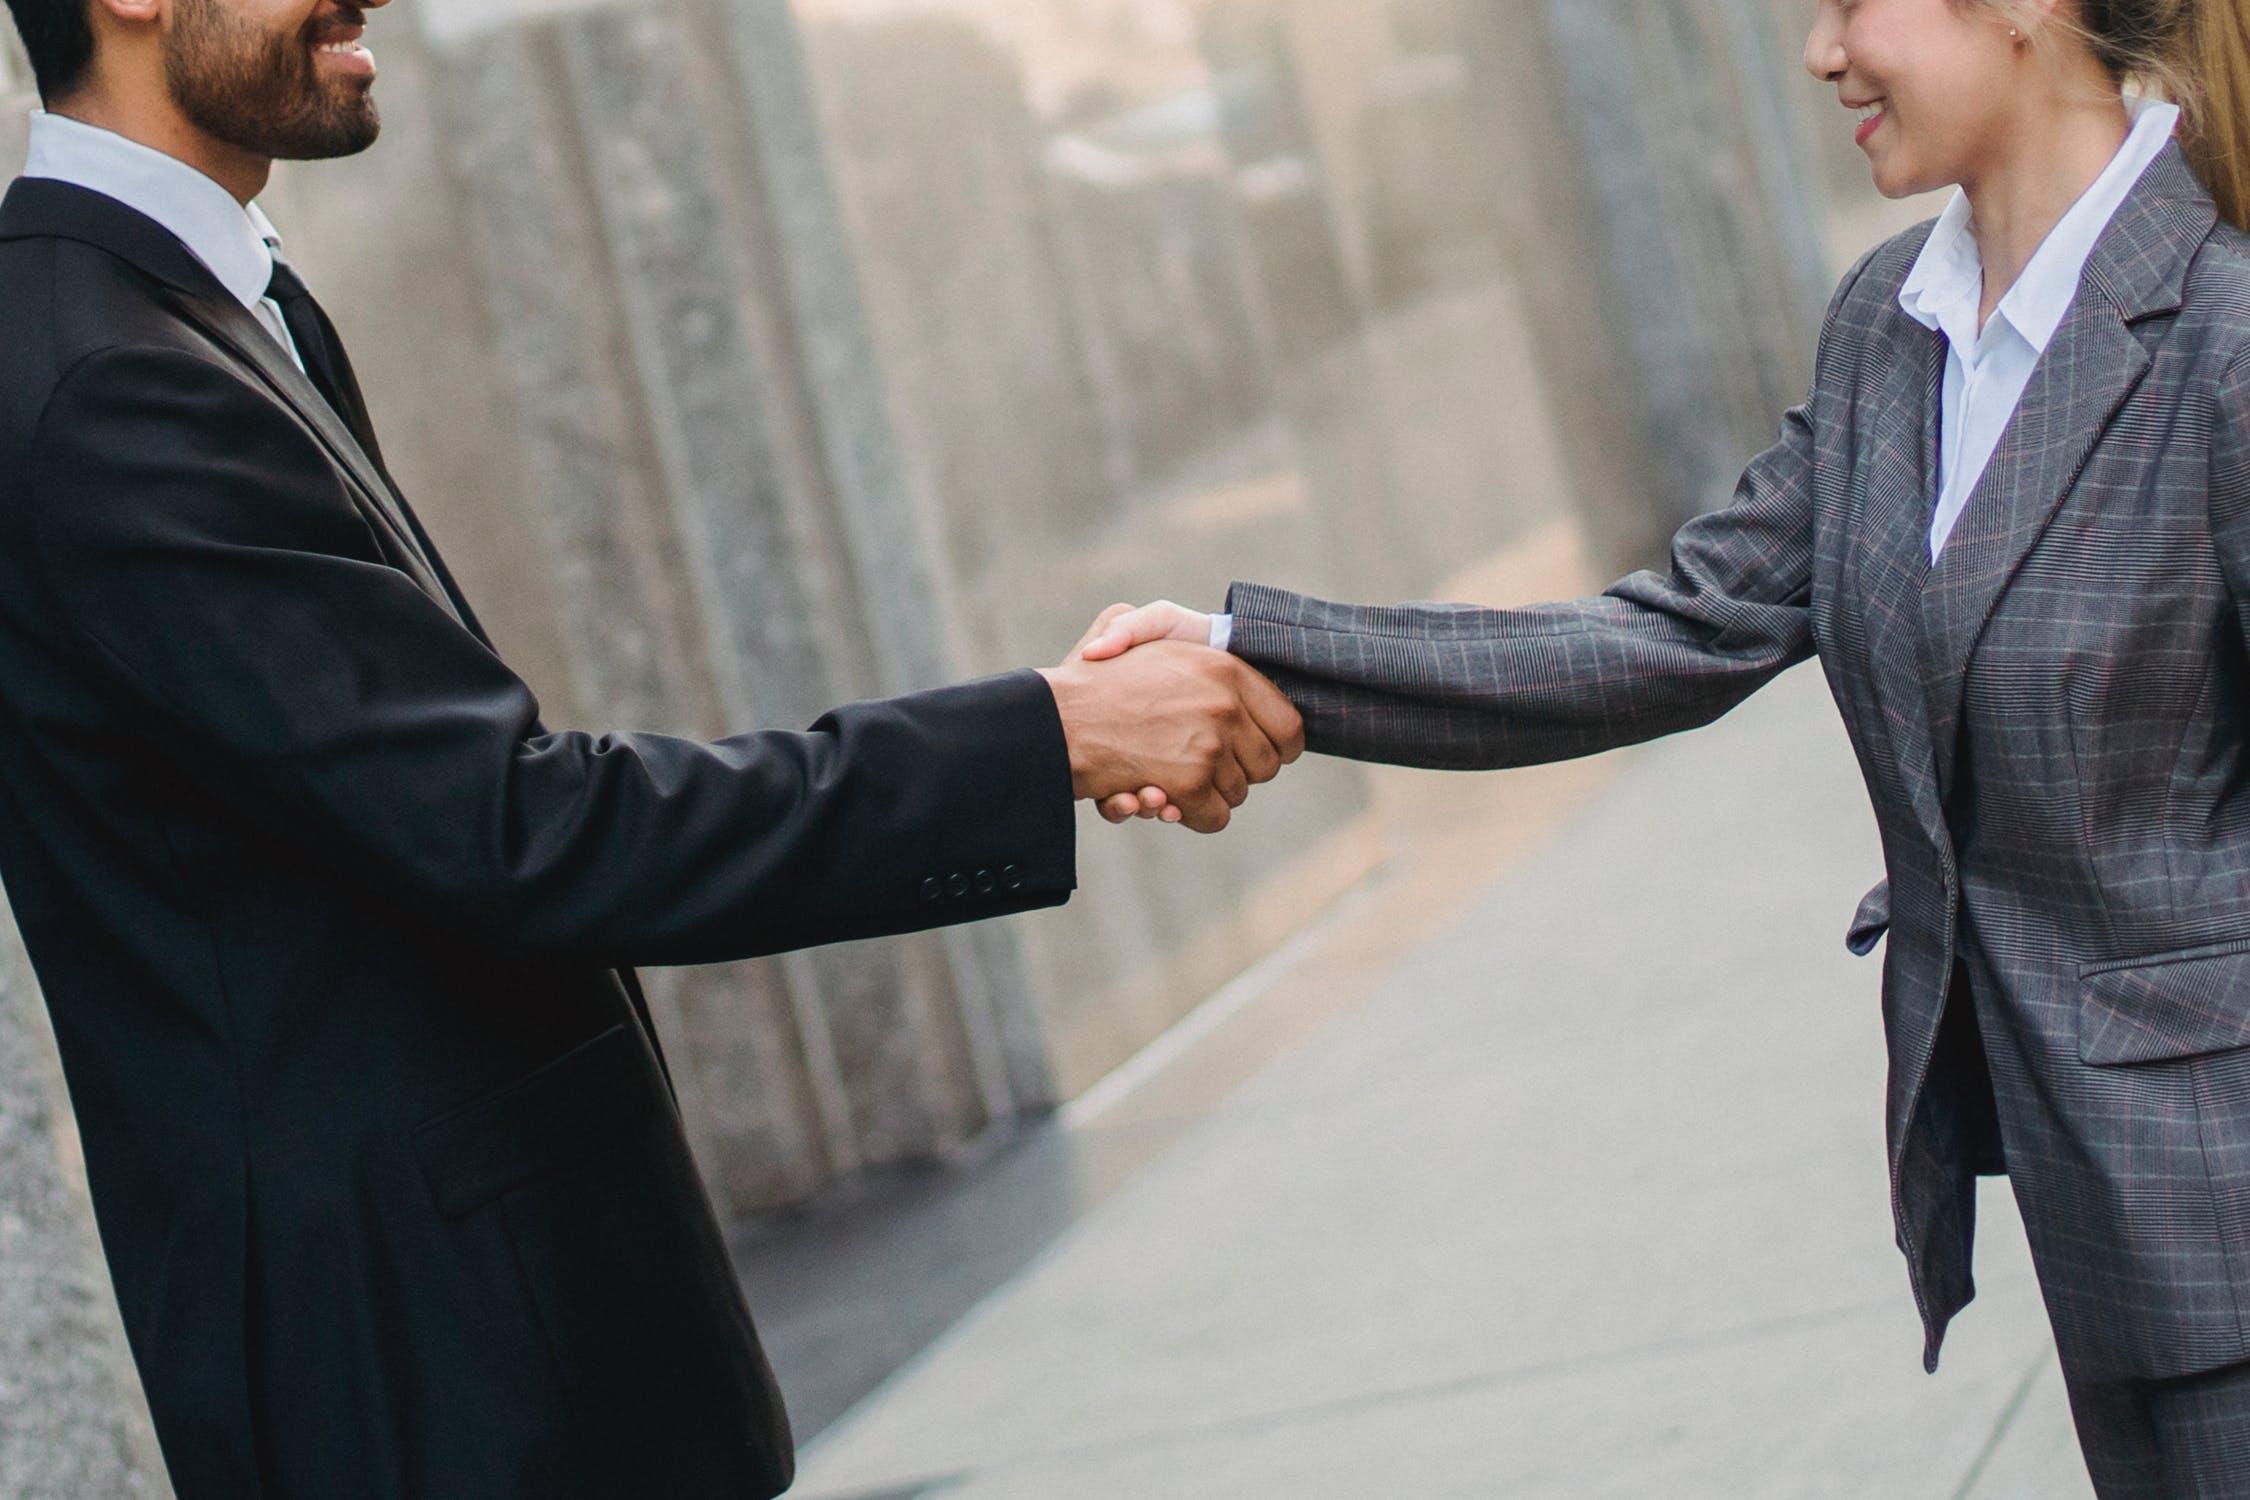 Two shareholders making a verbal agreement via a handshake.